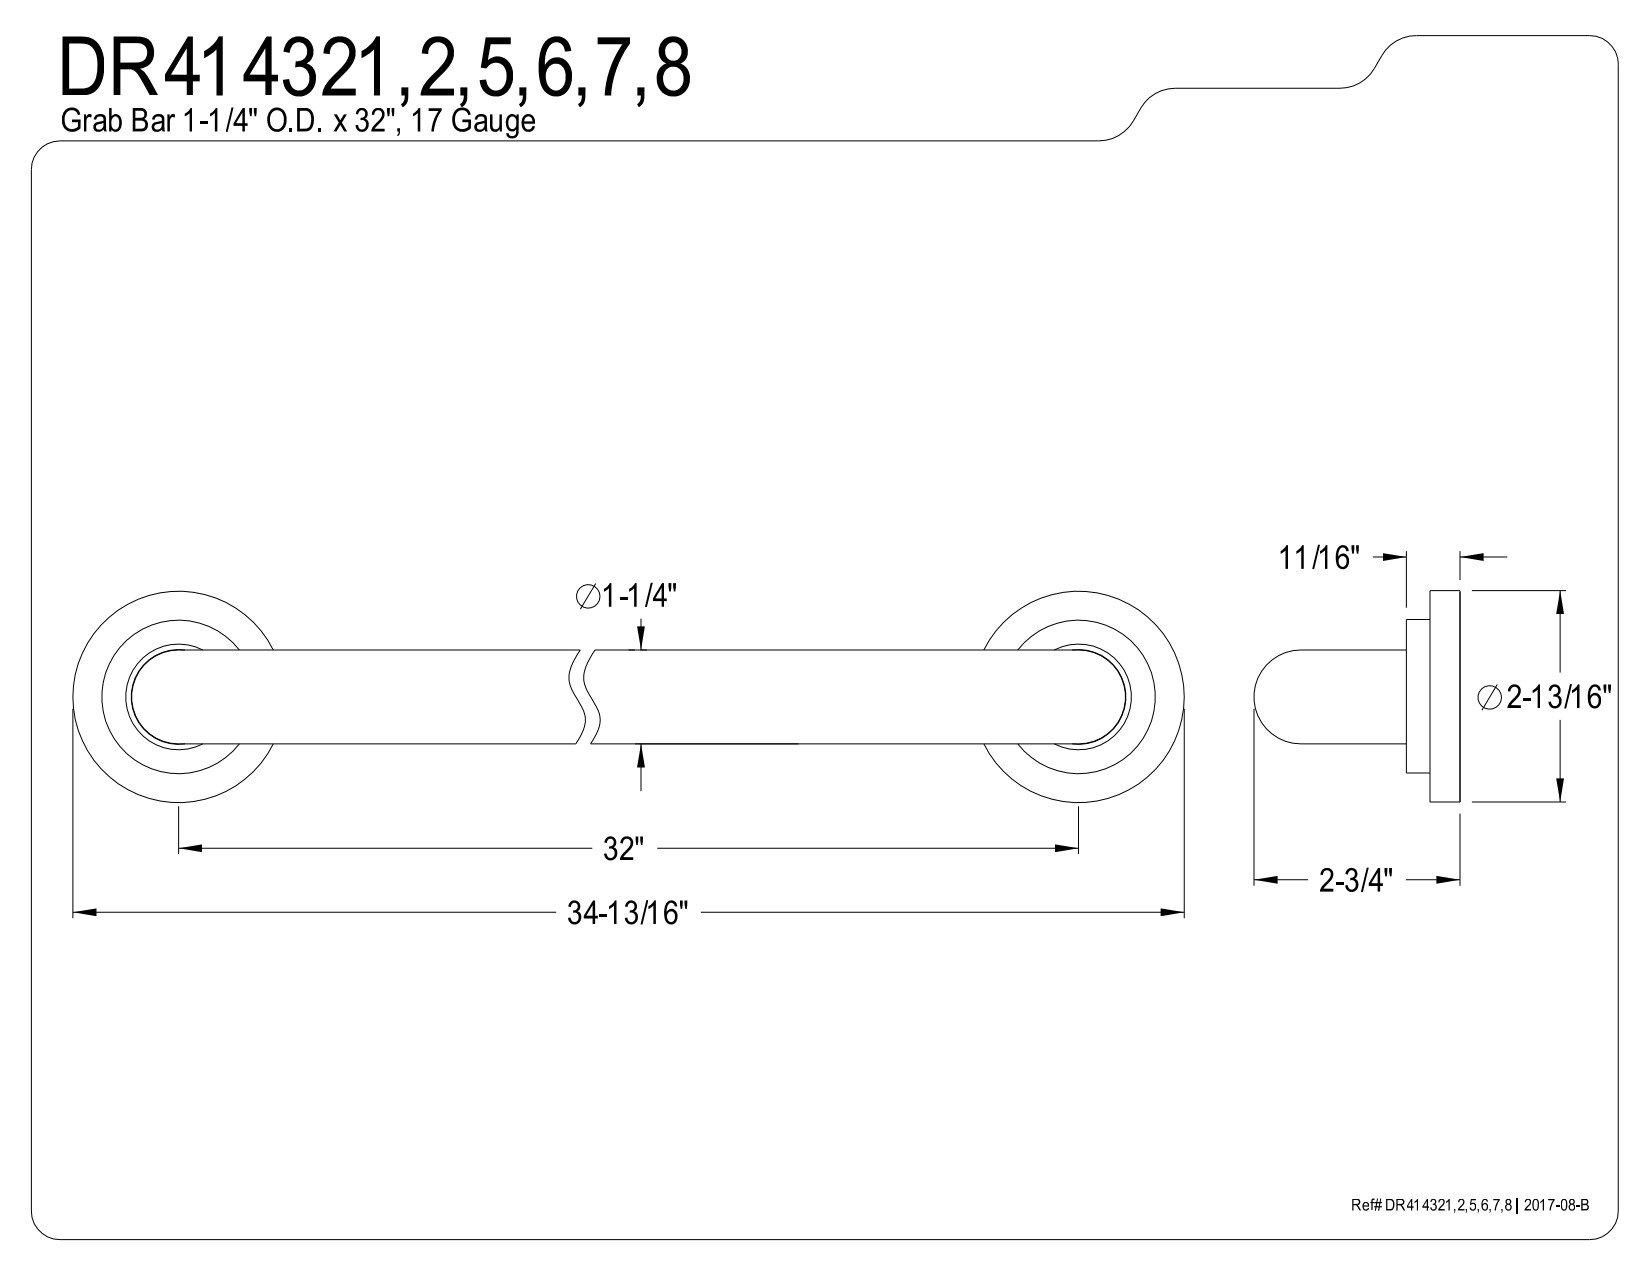 Kingston Brass DR414325 Designer Trimscape Manhattan Decor 32-Inch Grab Bar with 1.25-Inch Outer Diameter, Oil Rubbed Bronze